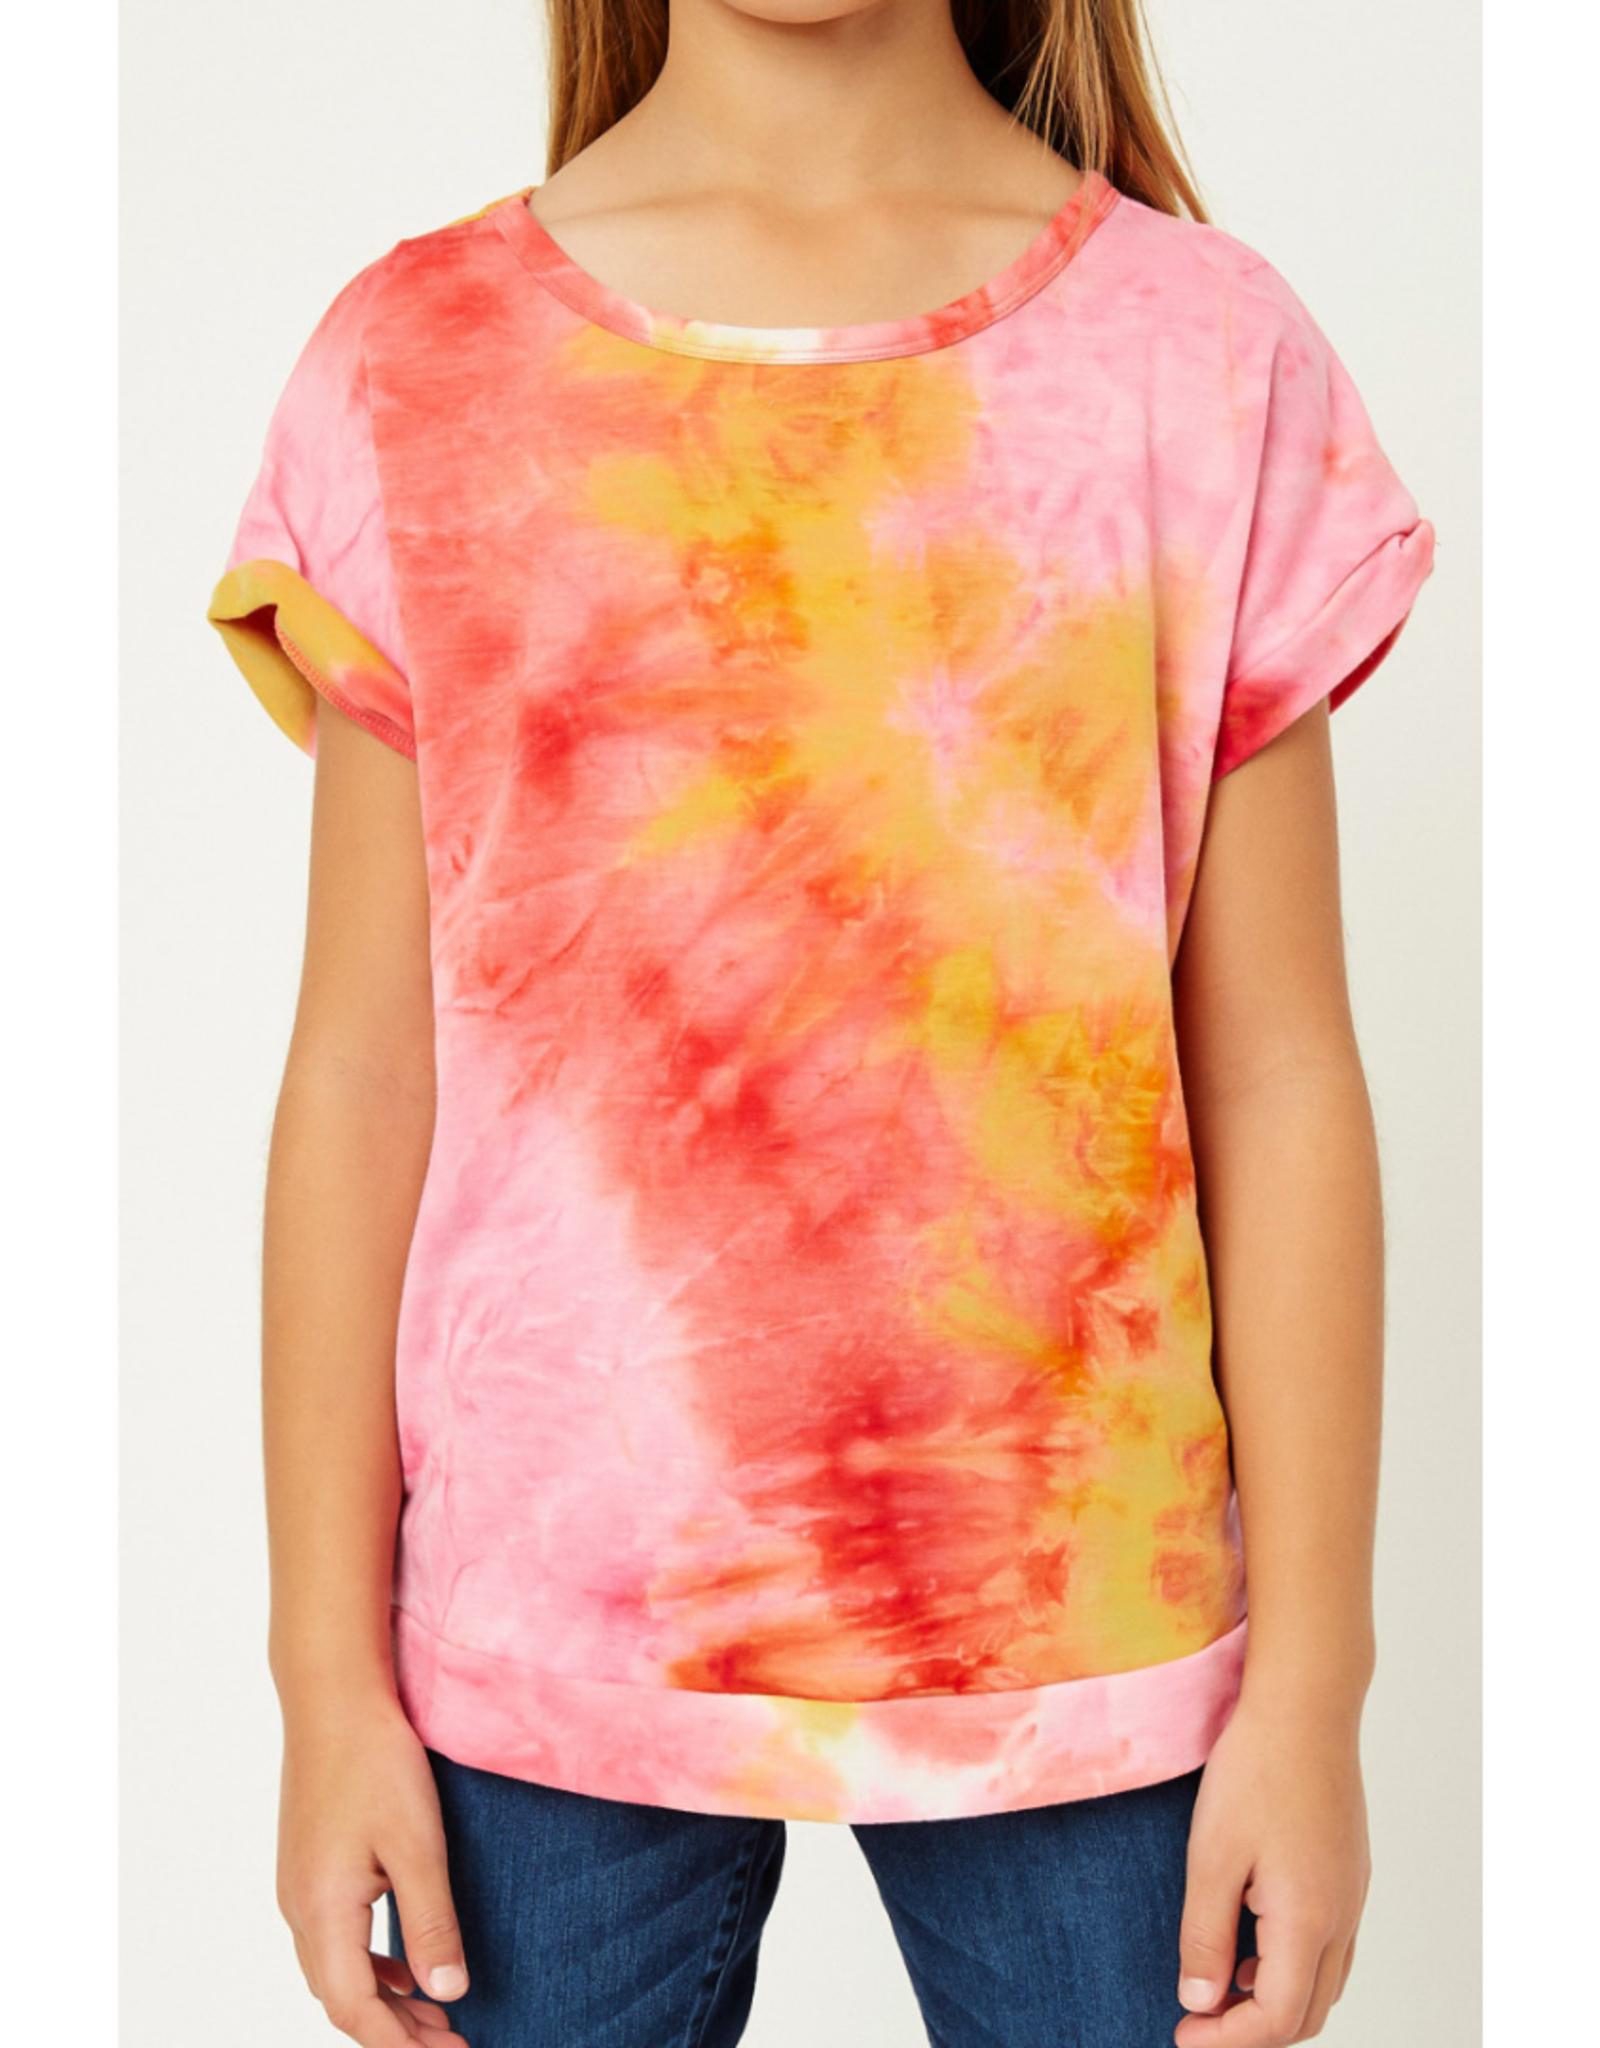 Hayden Girls Hayden Girls Tie Dye Shirt - Pink/Yellow